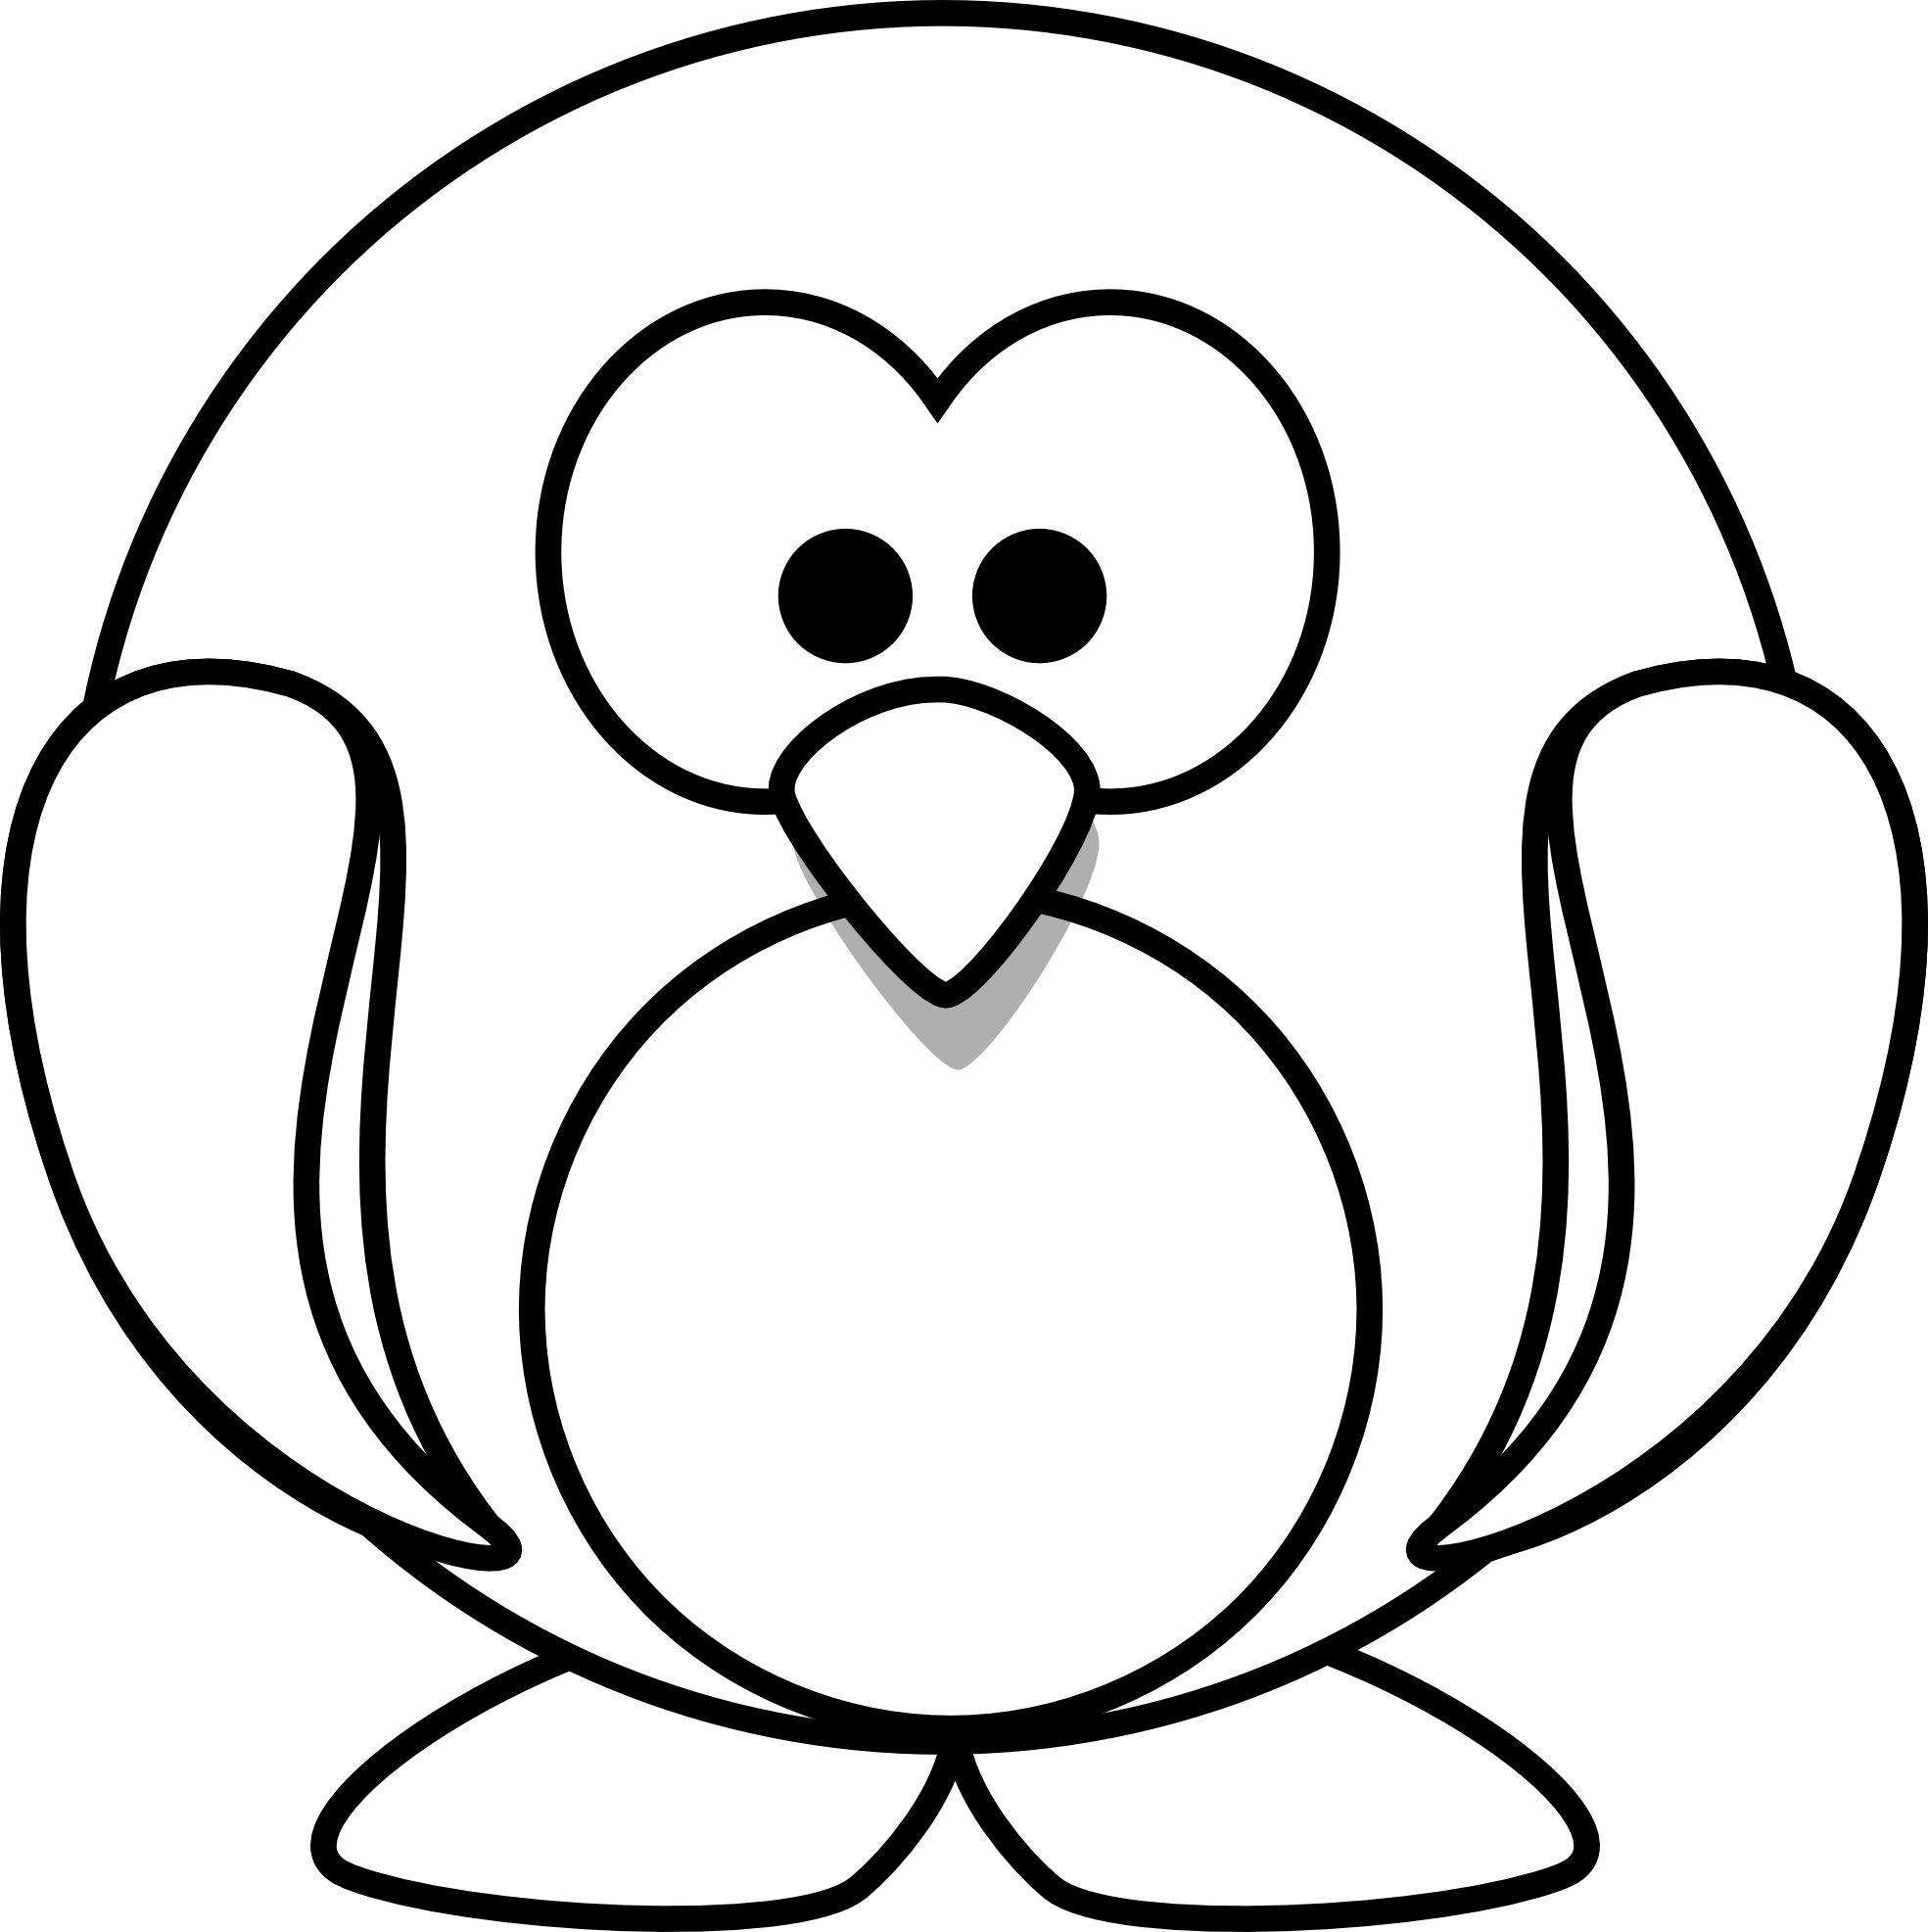 Penguin black and white. Clipart penquin merry christmas